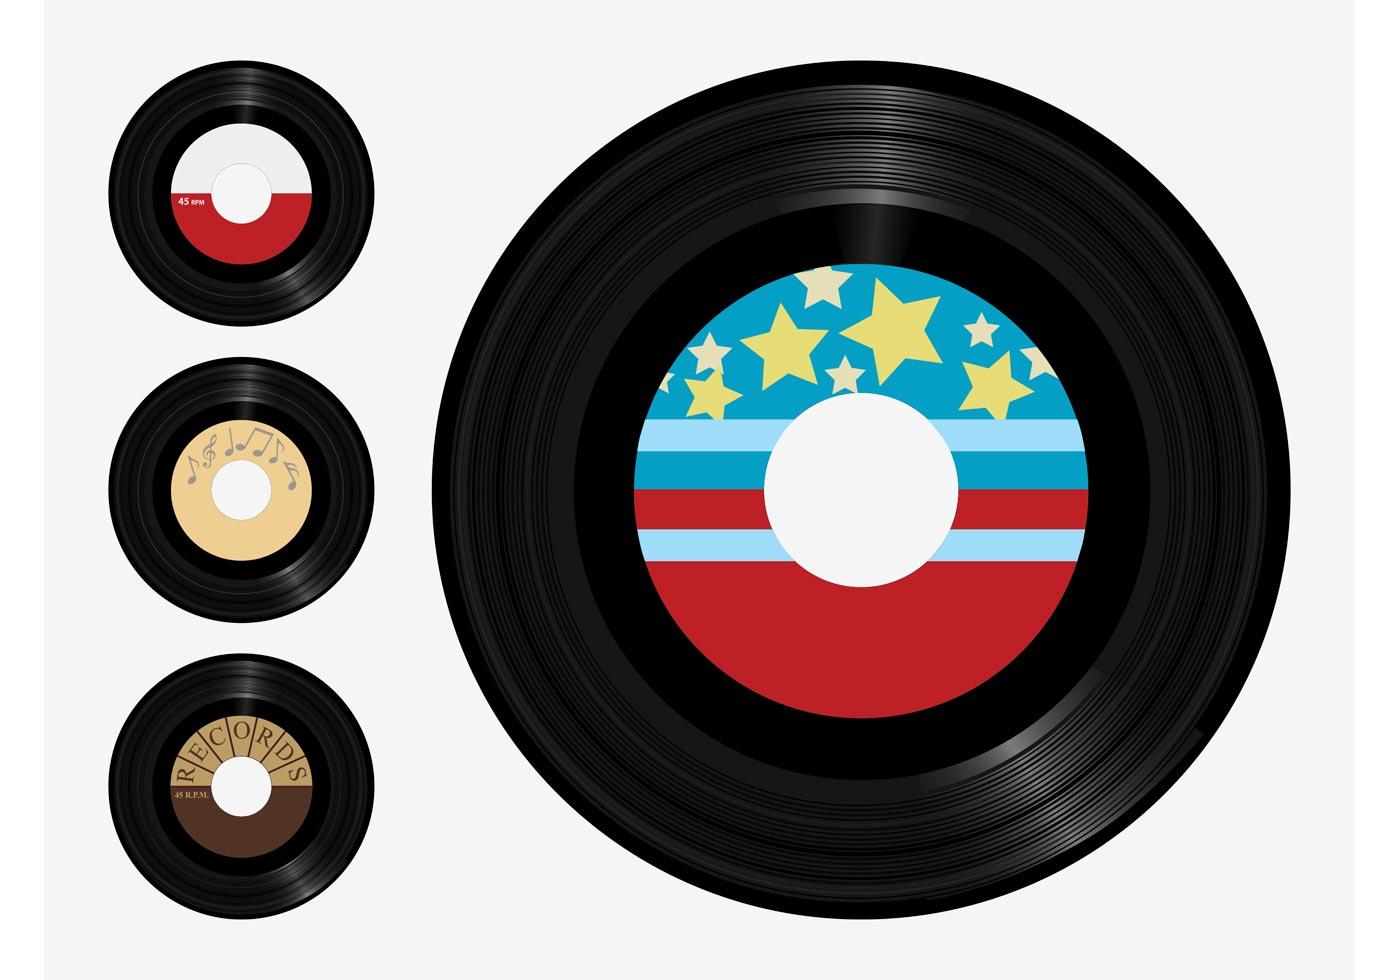 vinyl records vector download free vector art stock graphics images. Black Bedroom Furniture Sets. Home Design Ideas